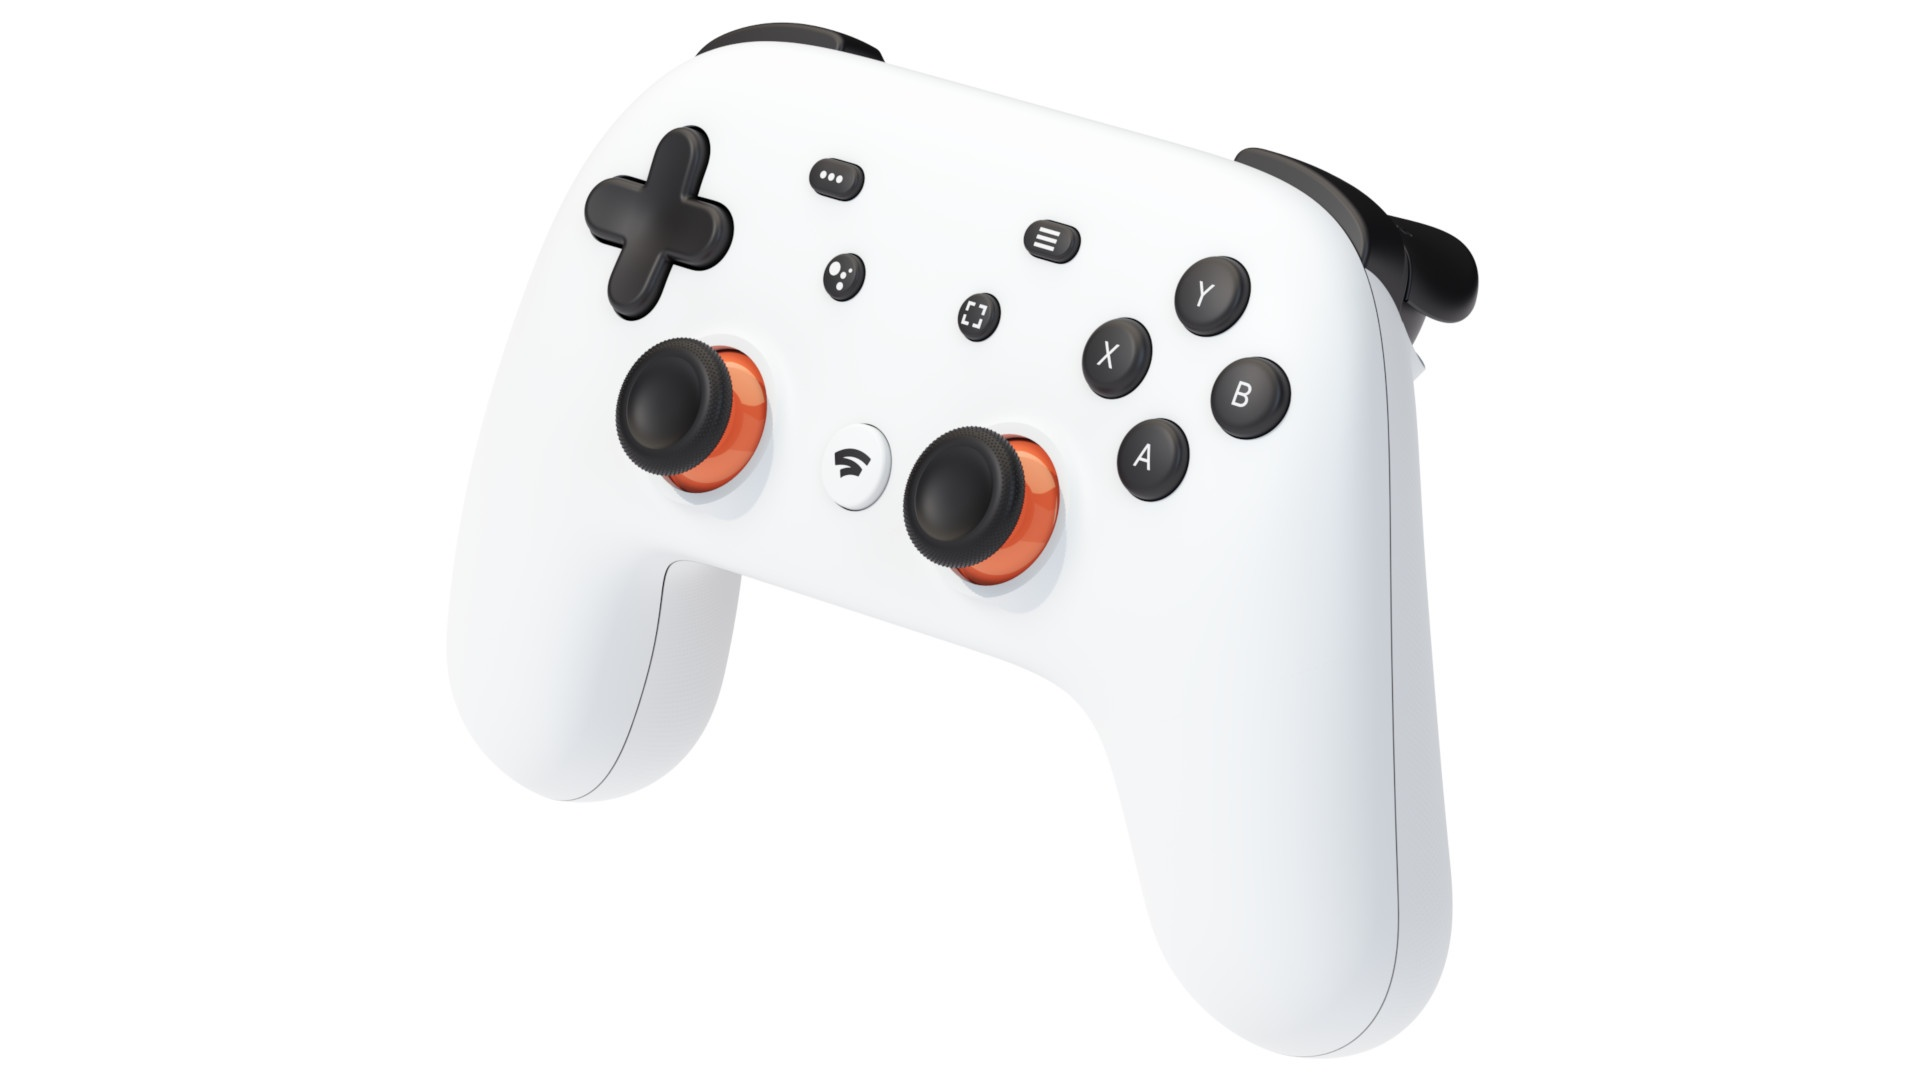 https://10images.cgames.de/images/gamestar/4/stadia-controller2_6068579.jpg